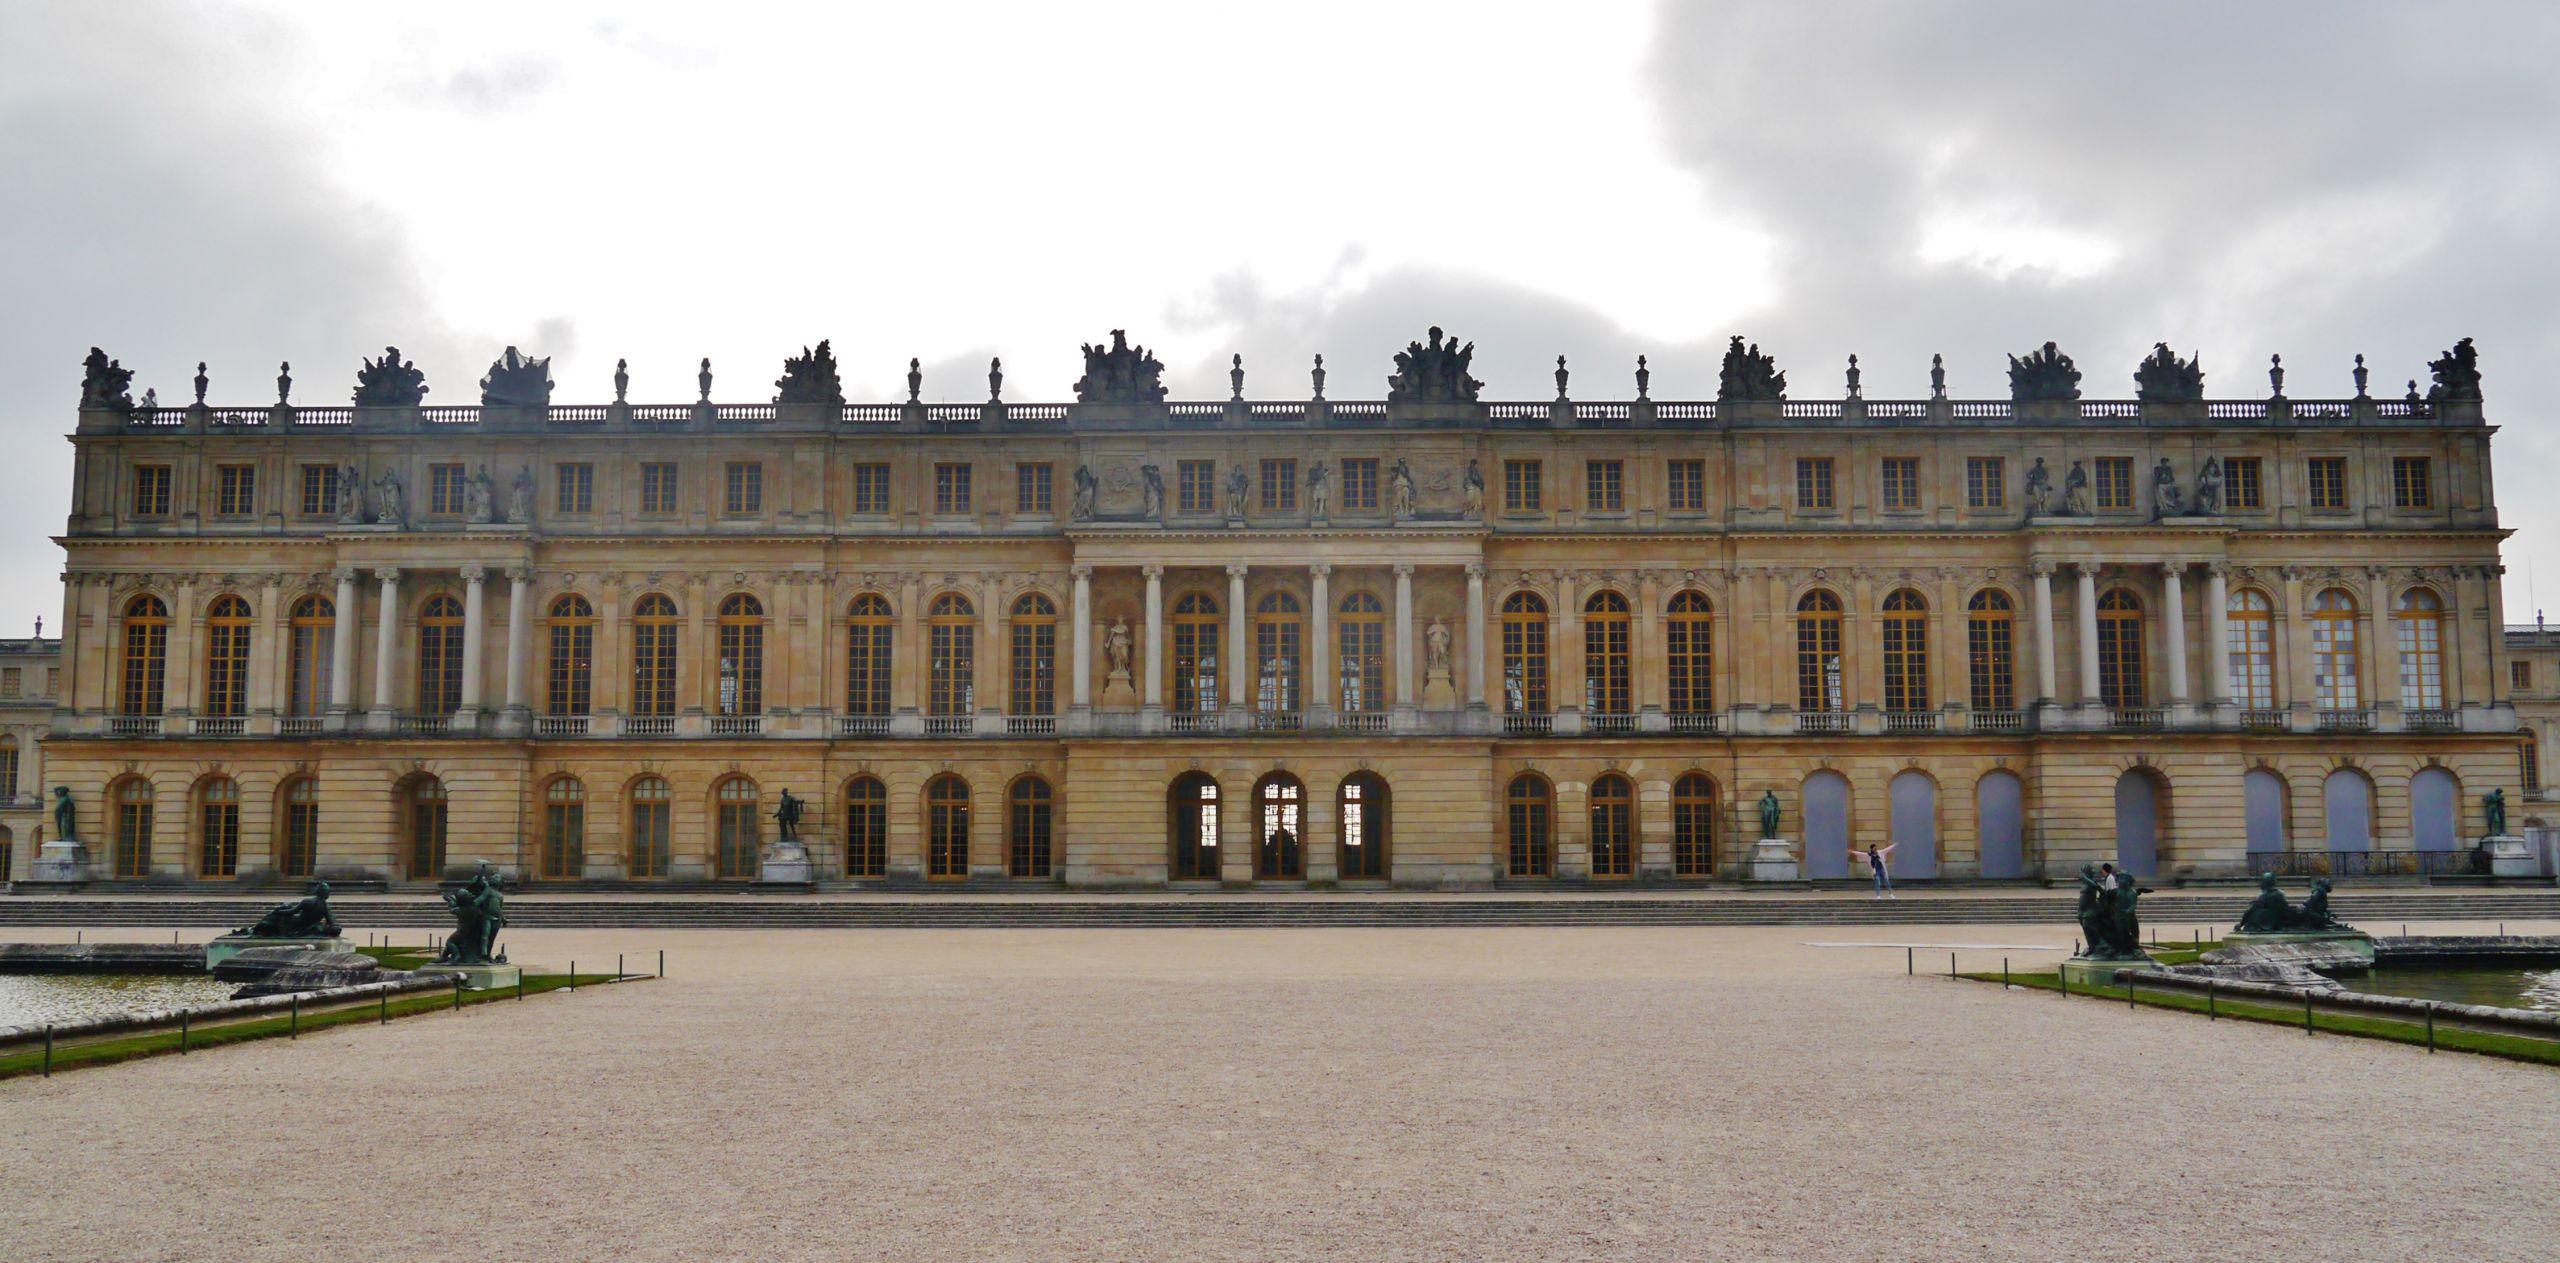 Garten Versailles Schön File Versailles Ch¢teau De Versailles Gartenseite 3